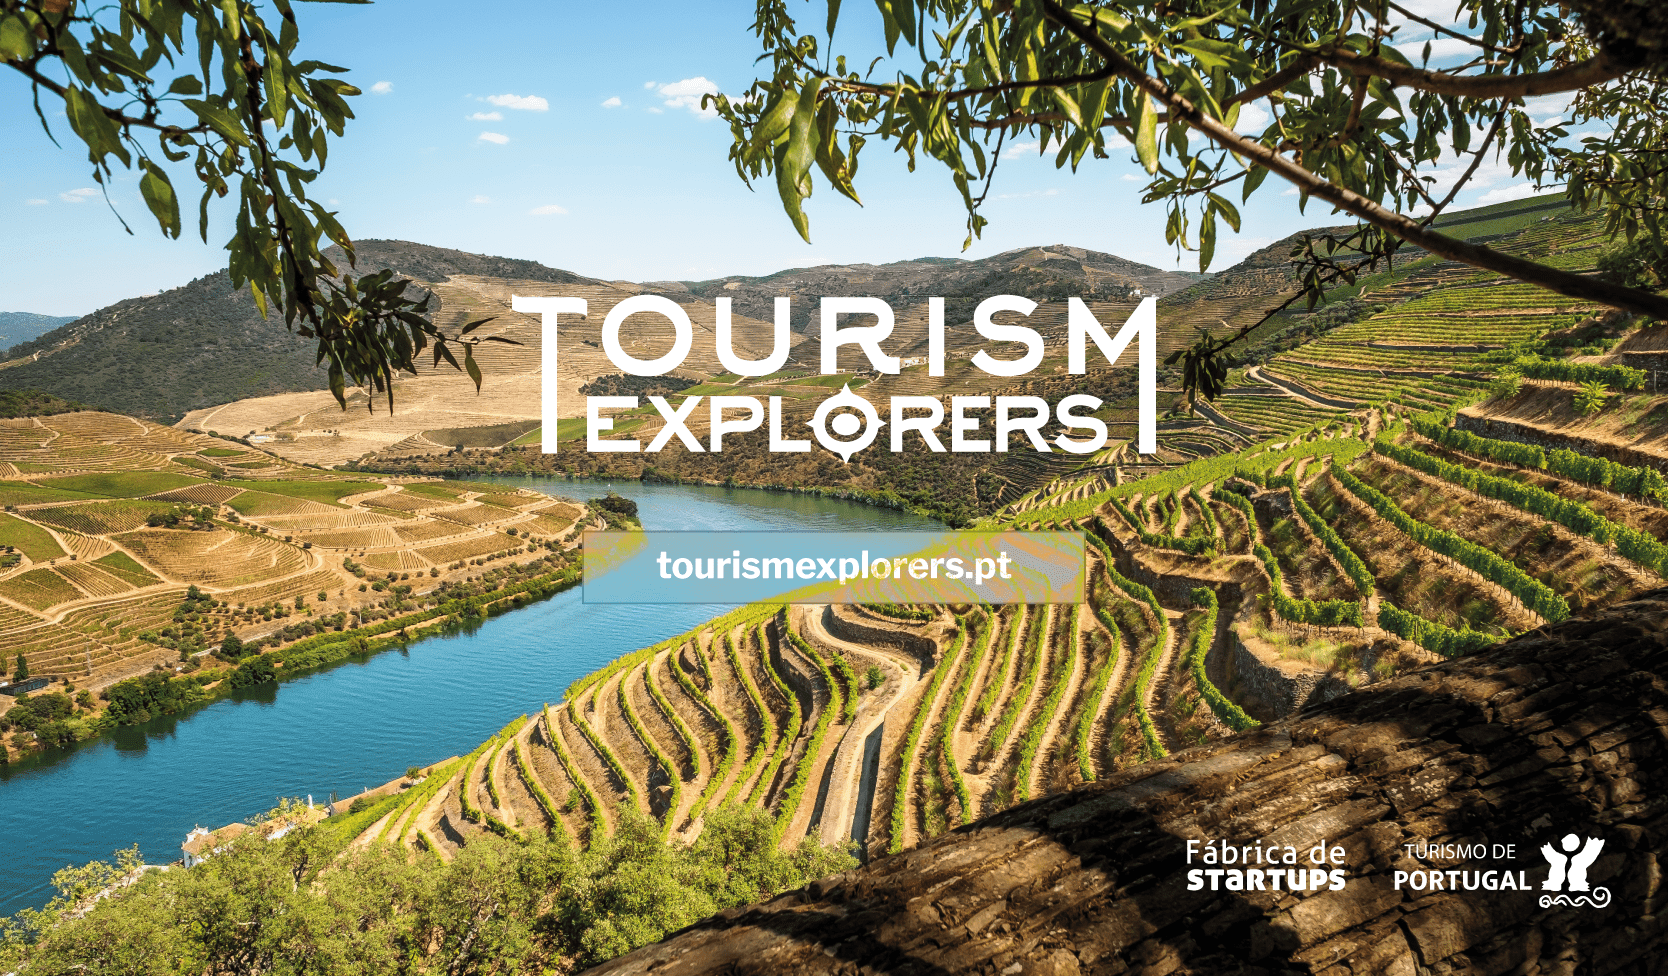 Tourism Explorers Image